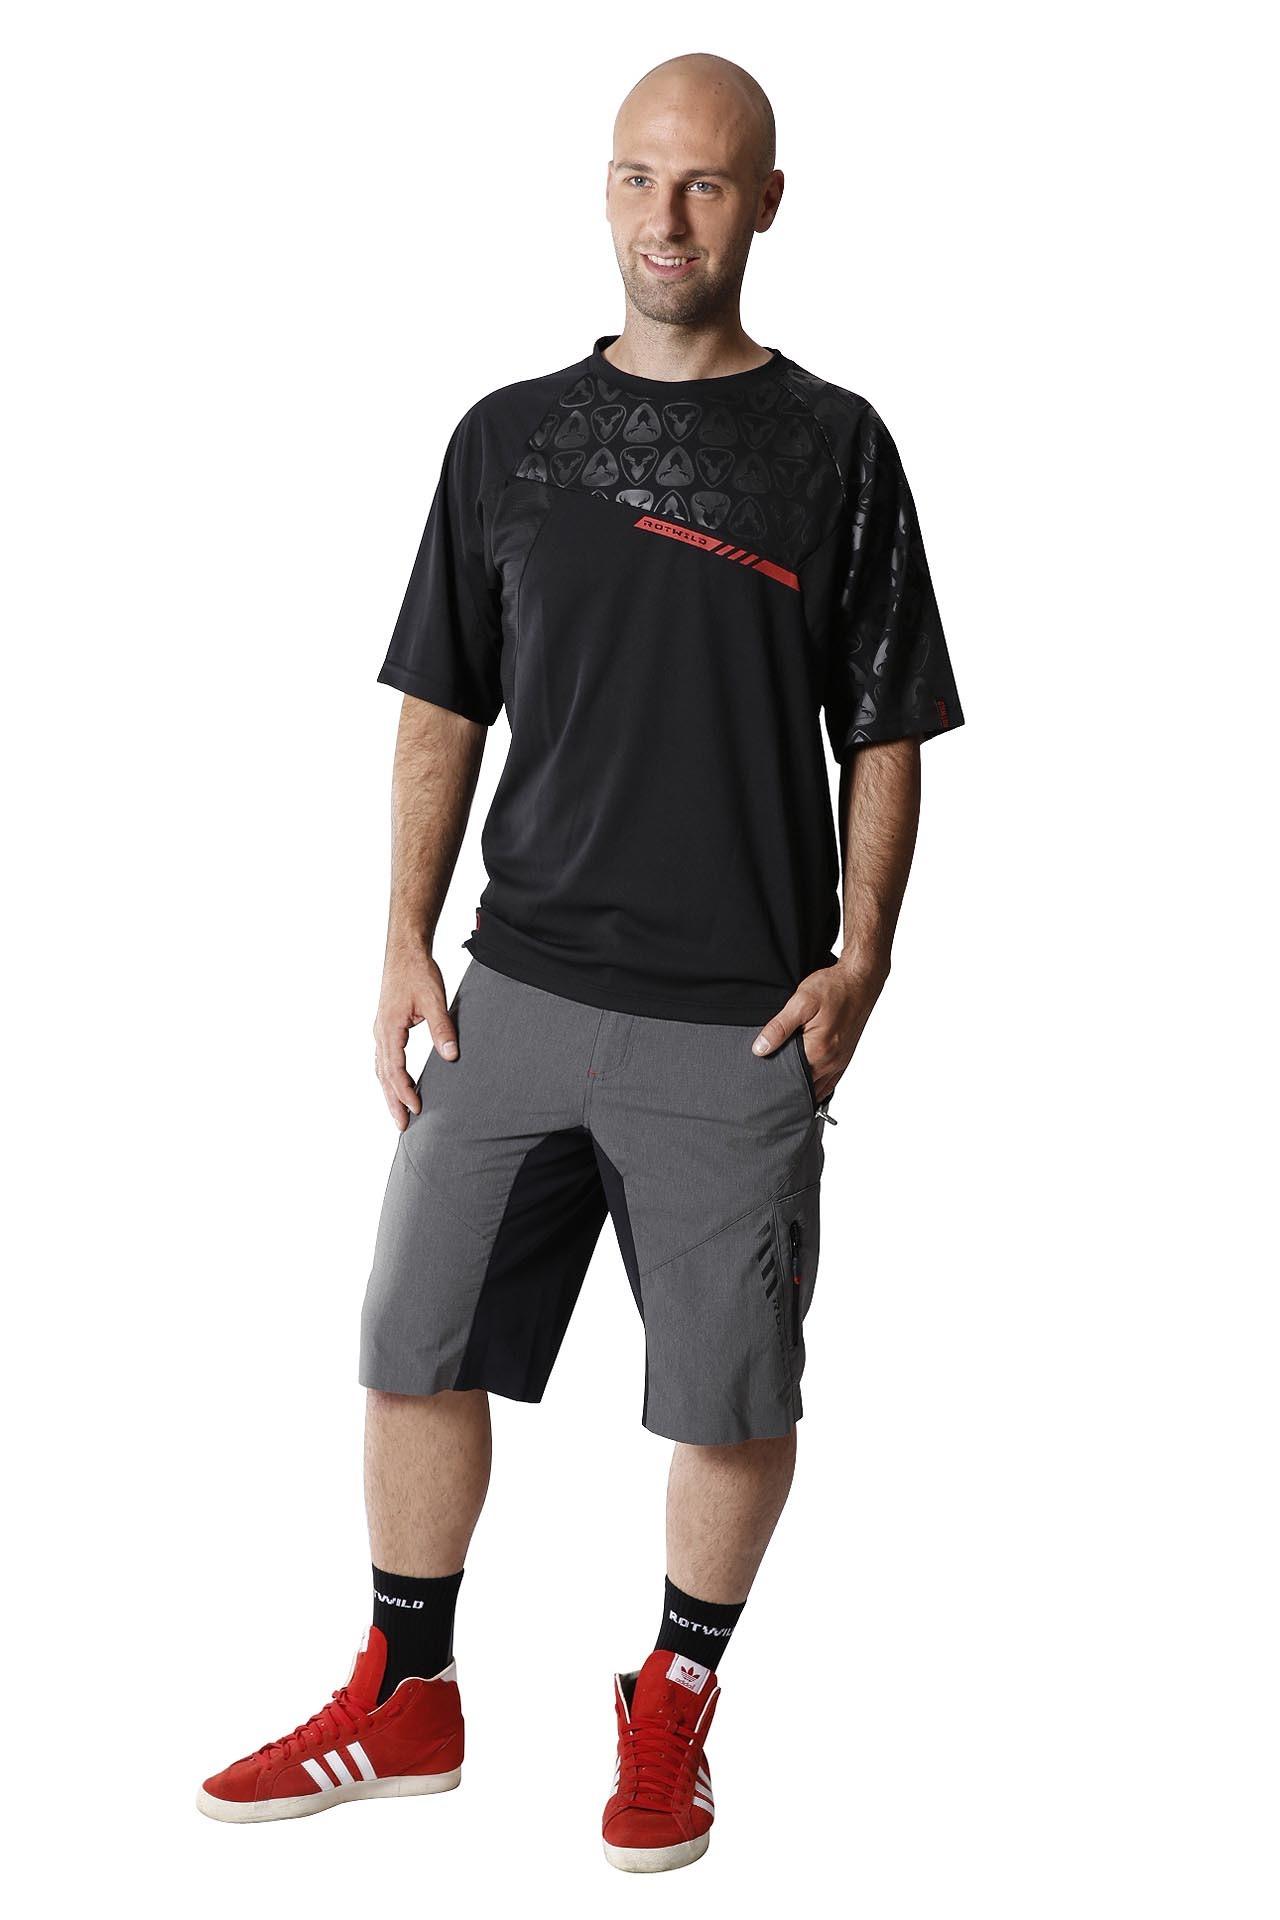 Rotwild RCD Shirt black